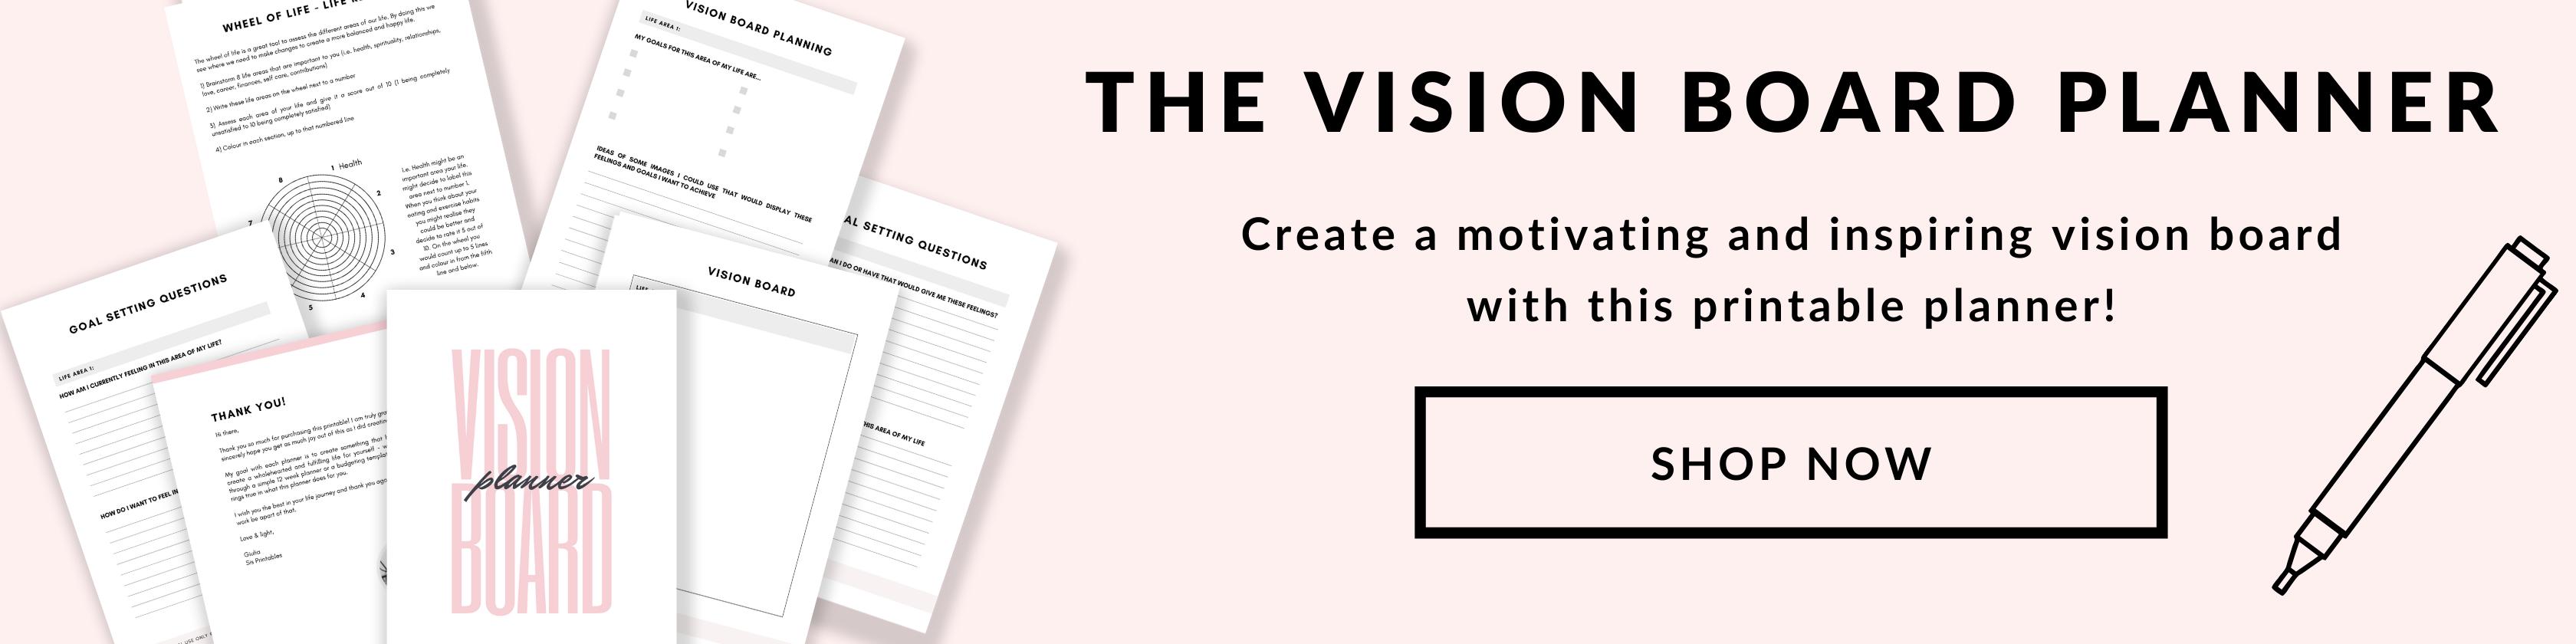 Vision Board Planner Printable